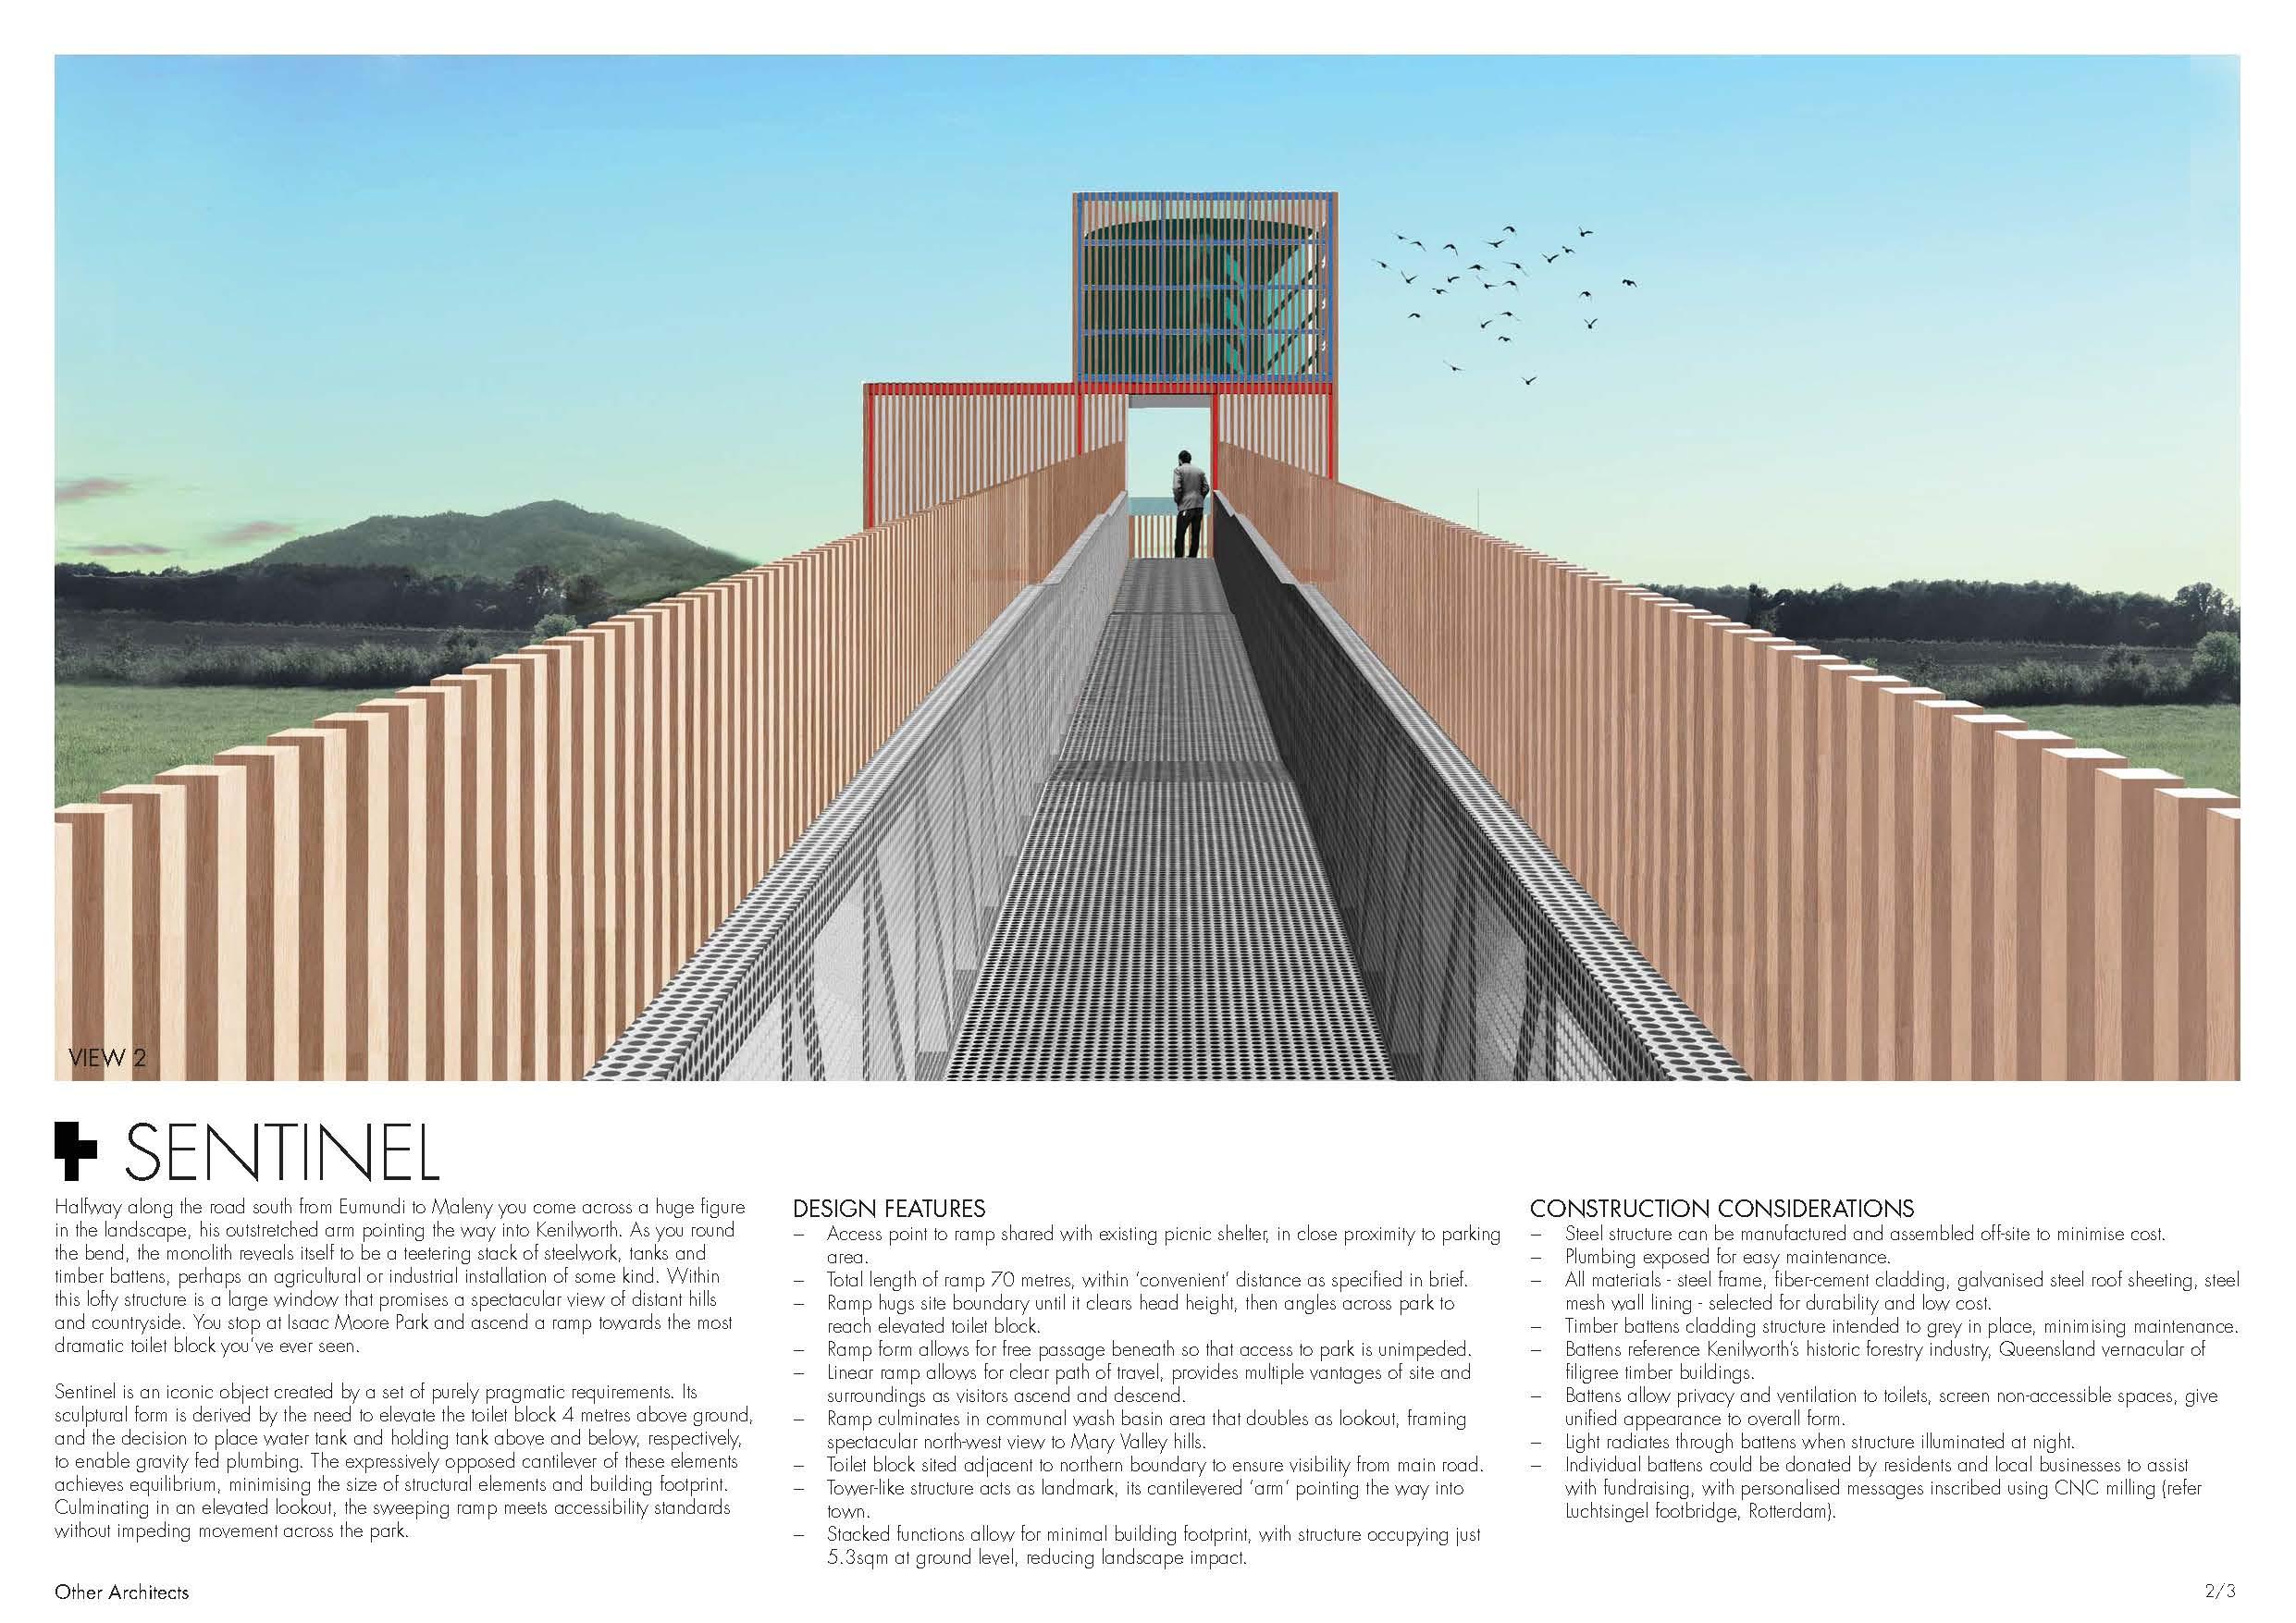 KenilworthDesignerDunny_Other Architects_Page_2.jpg